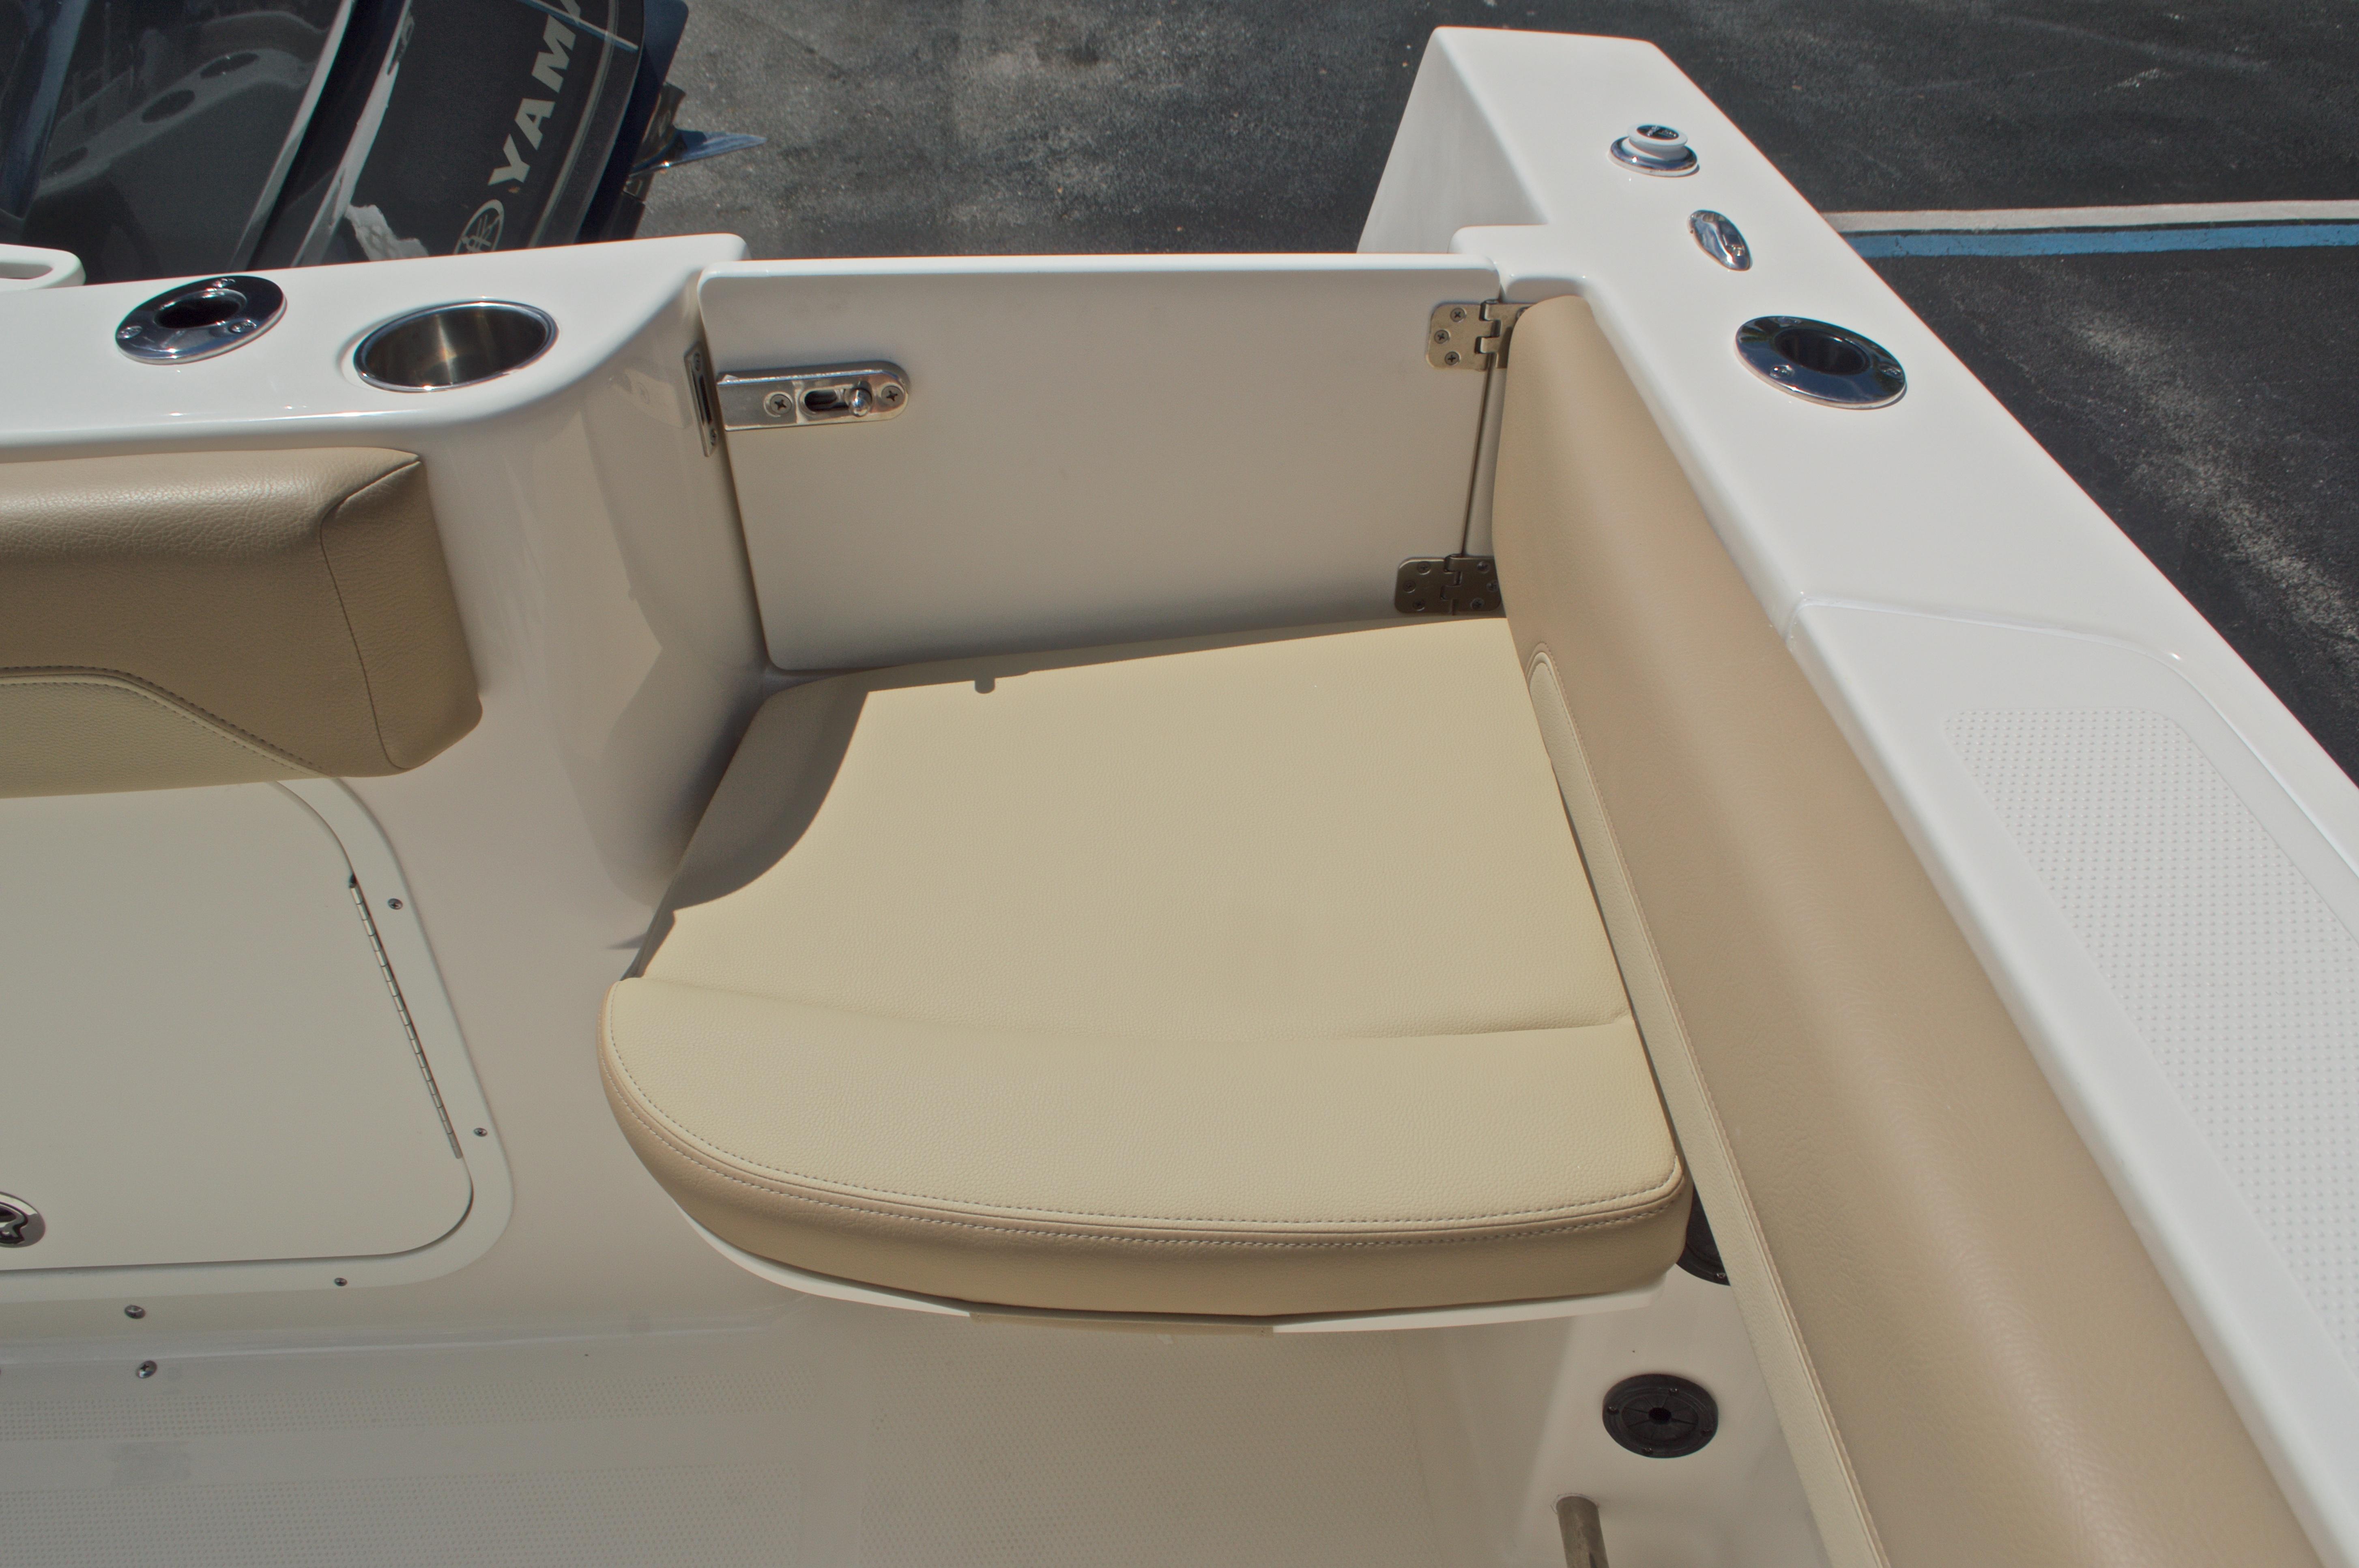 Thumbnail 18 for New 2017 Sailfish 240 CC Center Console boat for sale in Miami, FL